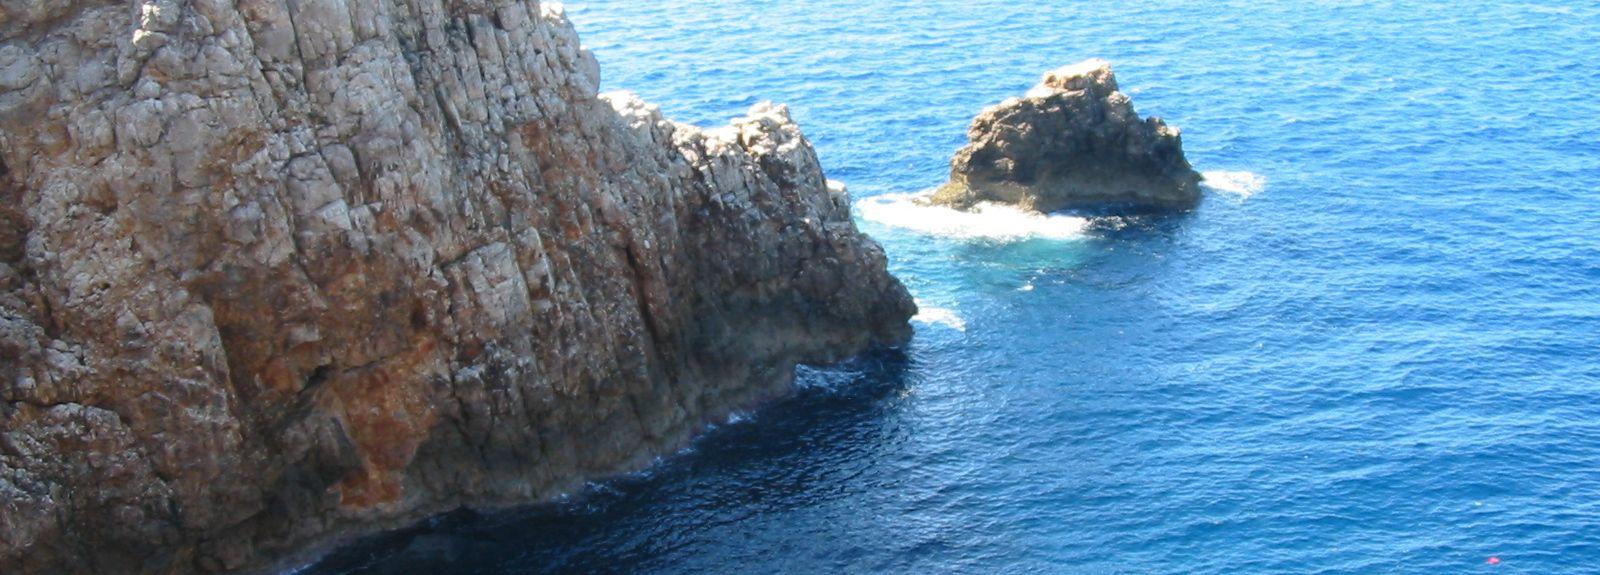 Cala en Brut, Balearic Islands, Spain